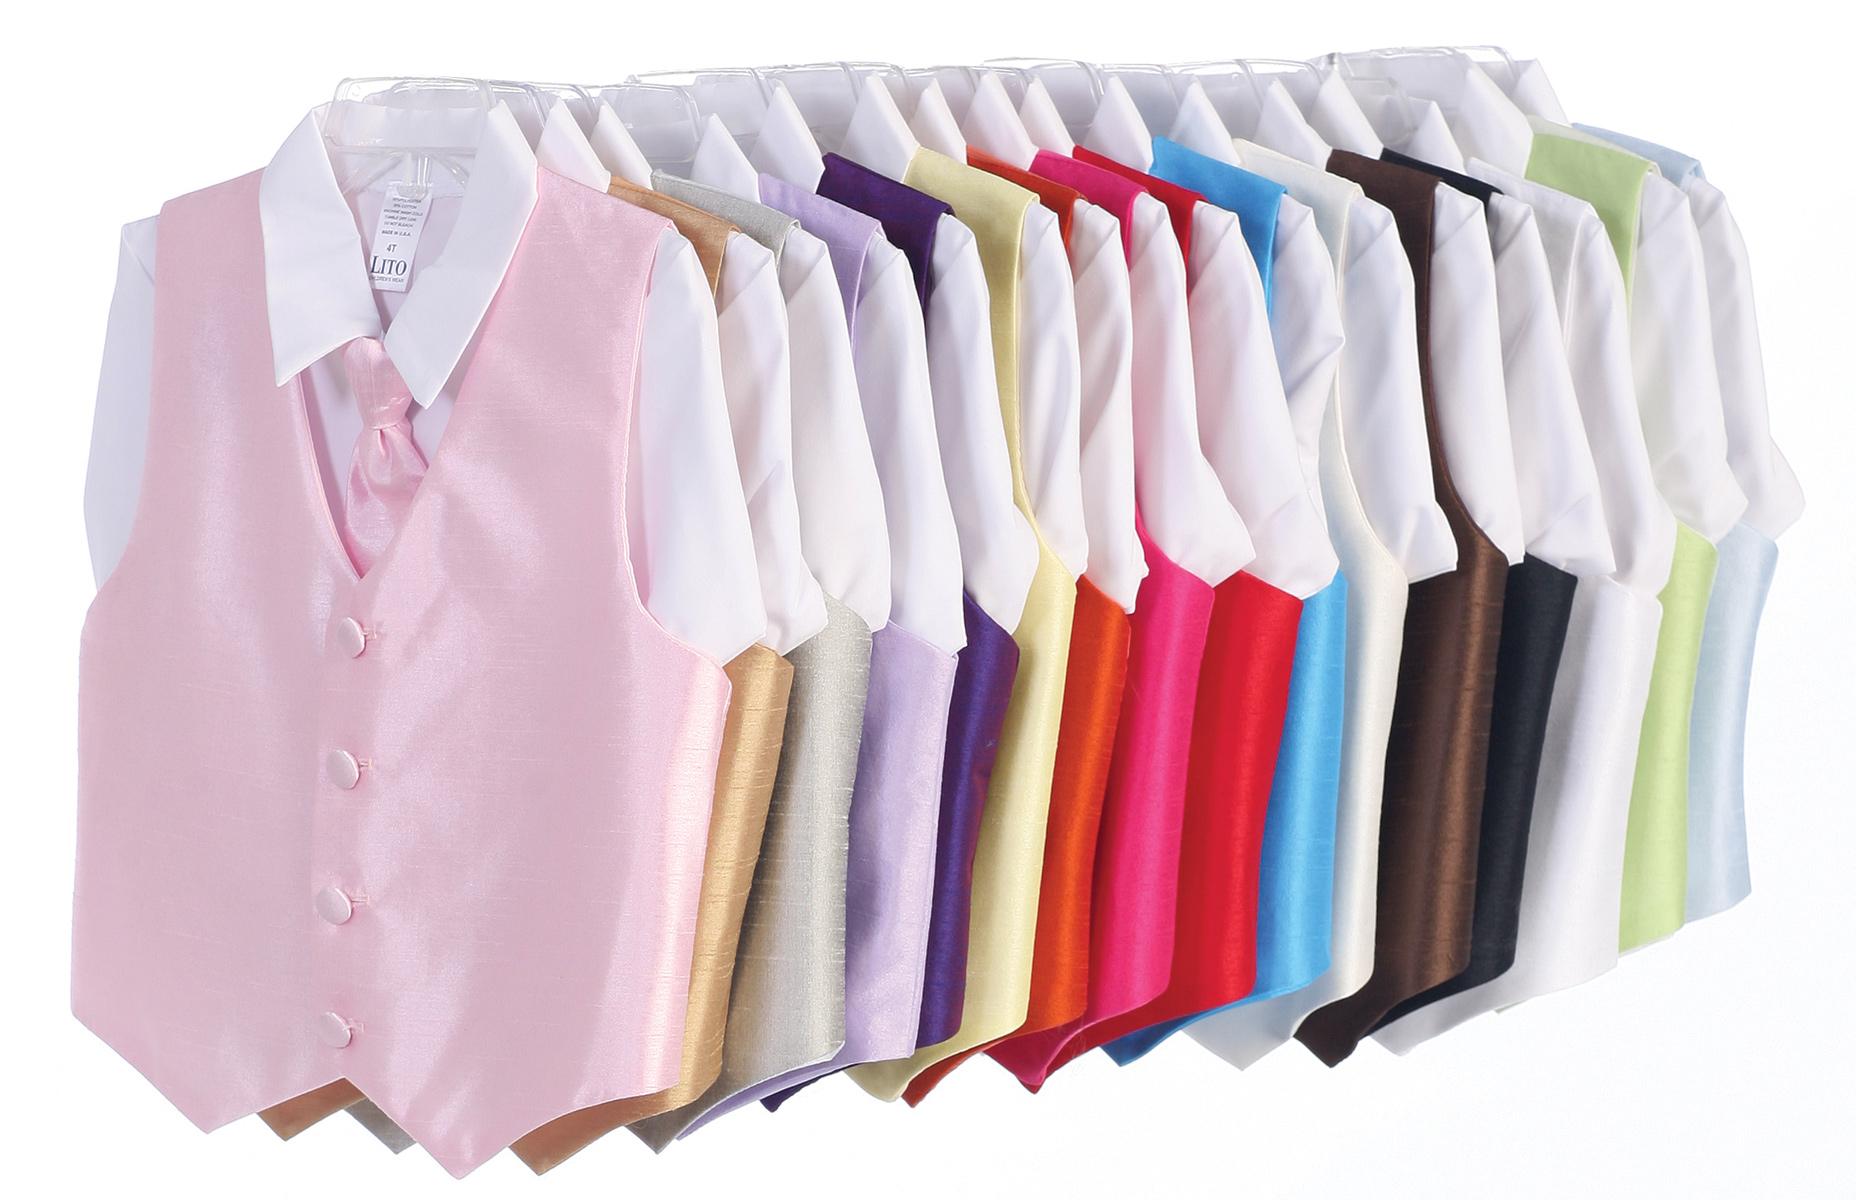 Vest and Clip On Necktie Set - Multiple Colors - Baby Infant Toddler Boys Sizes